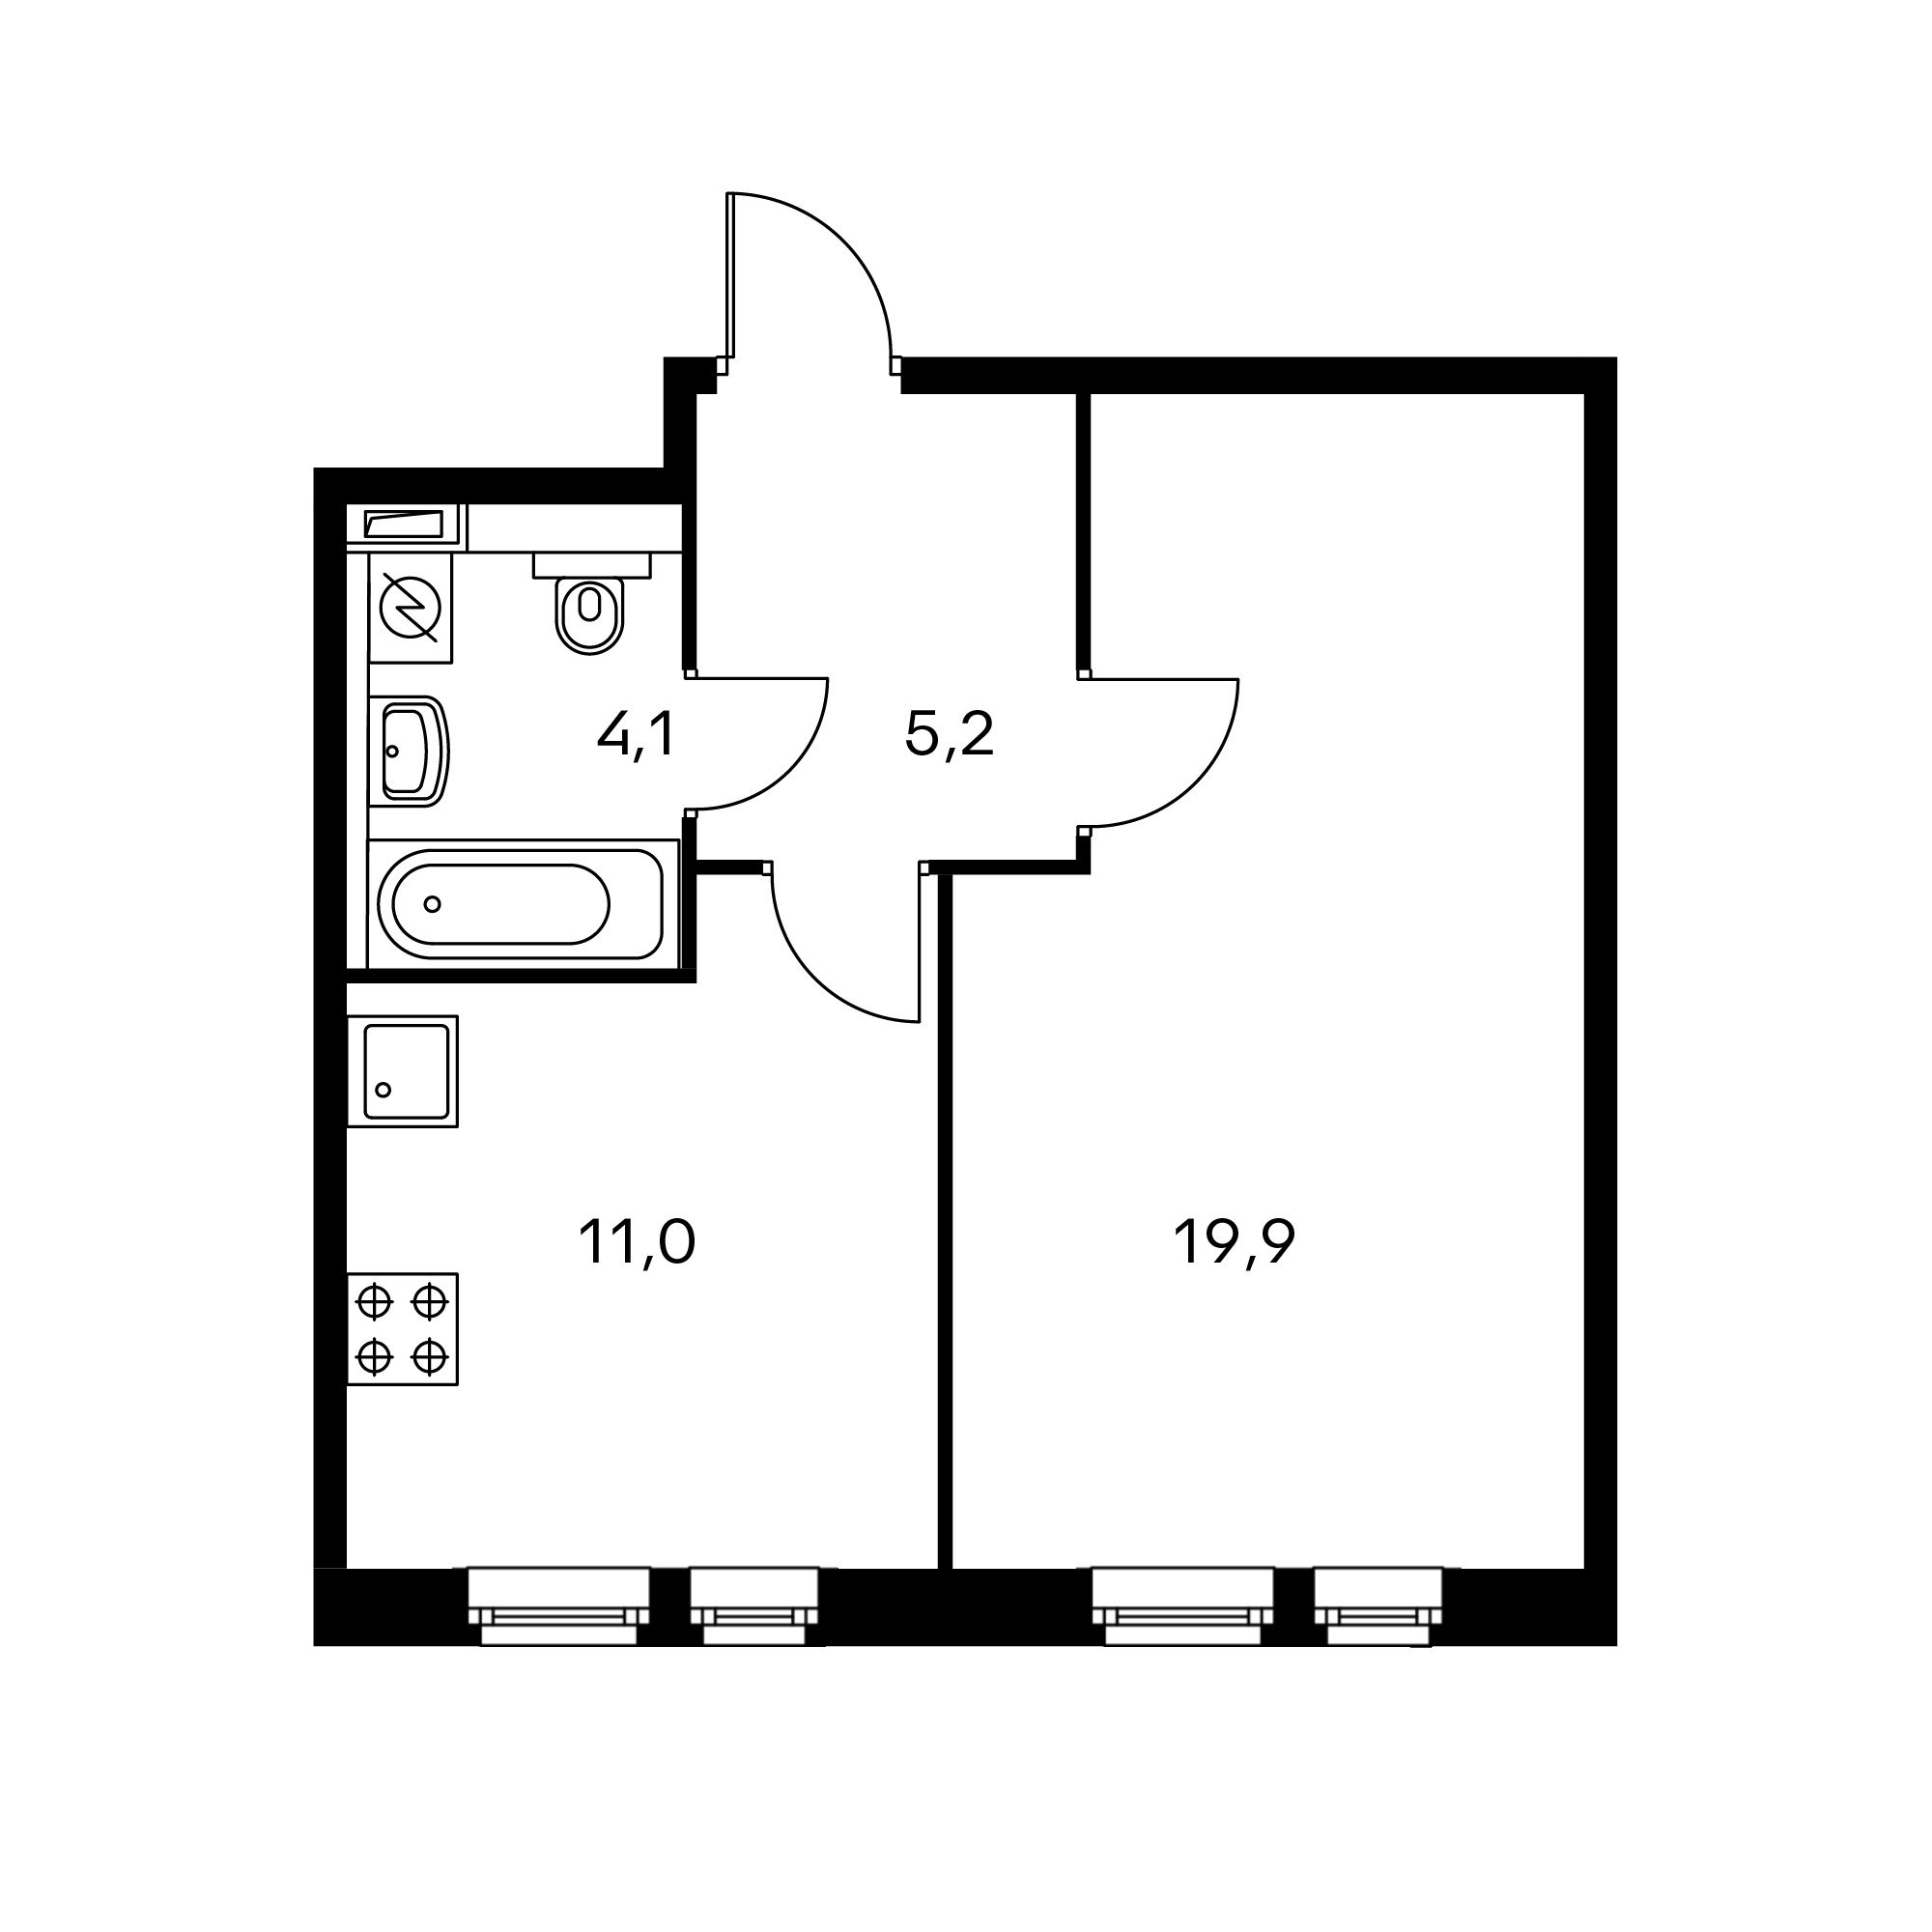 1KM1_6.9-7*